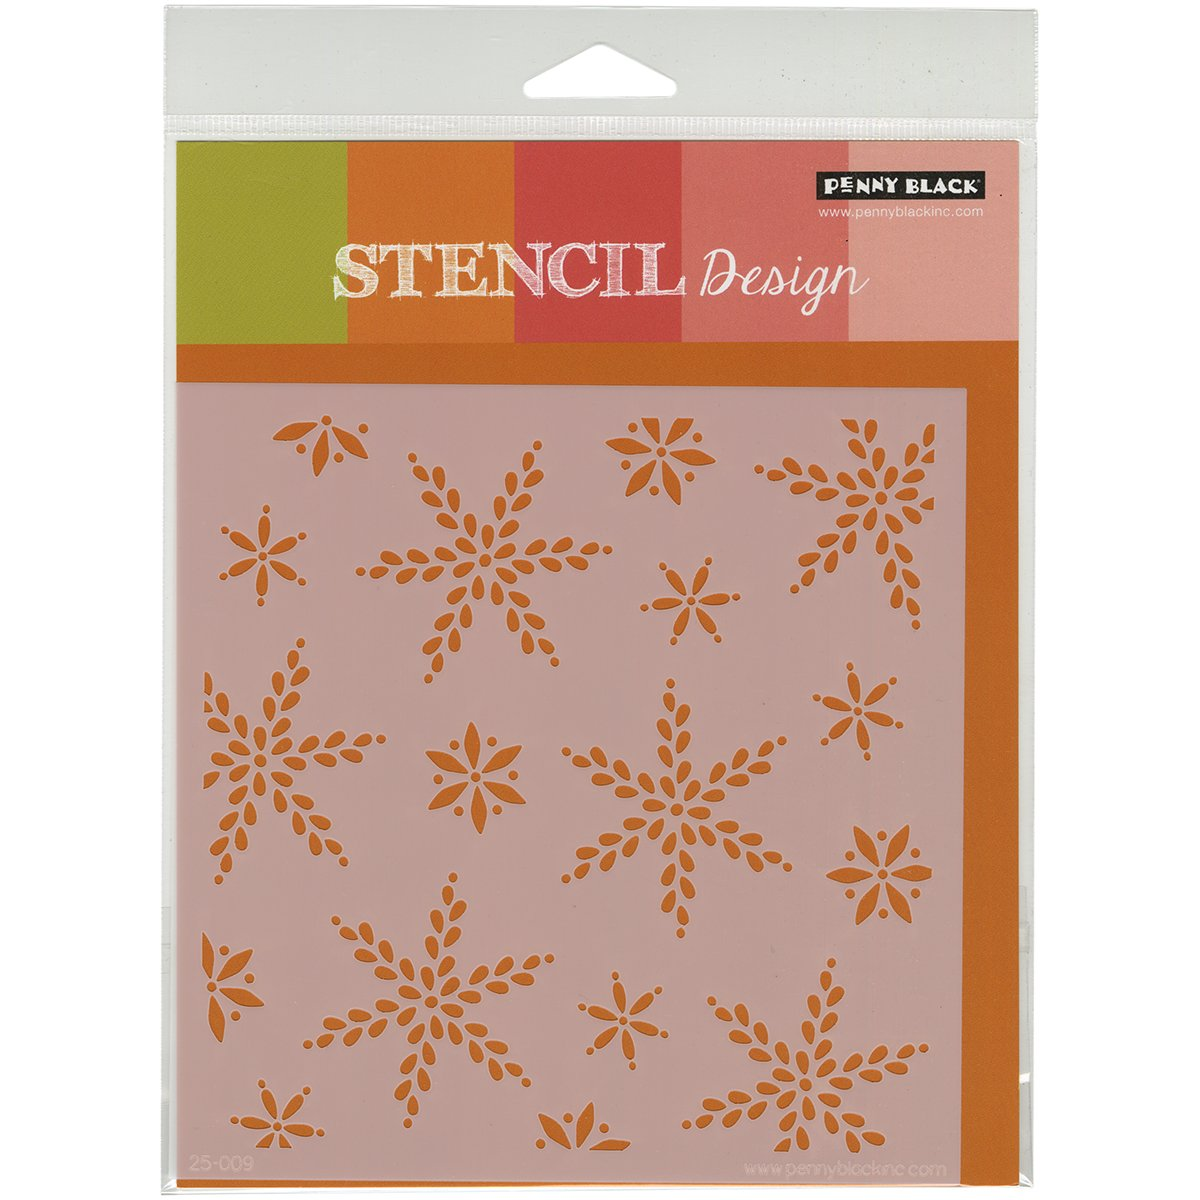 Penny Negro plástico Plantillas X DE 4,5 cm, Nieve Dance Dance Nieve 6a4756